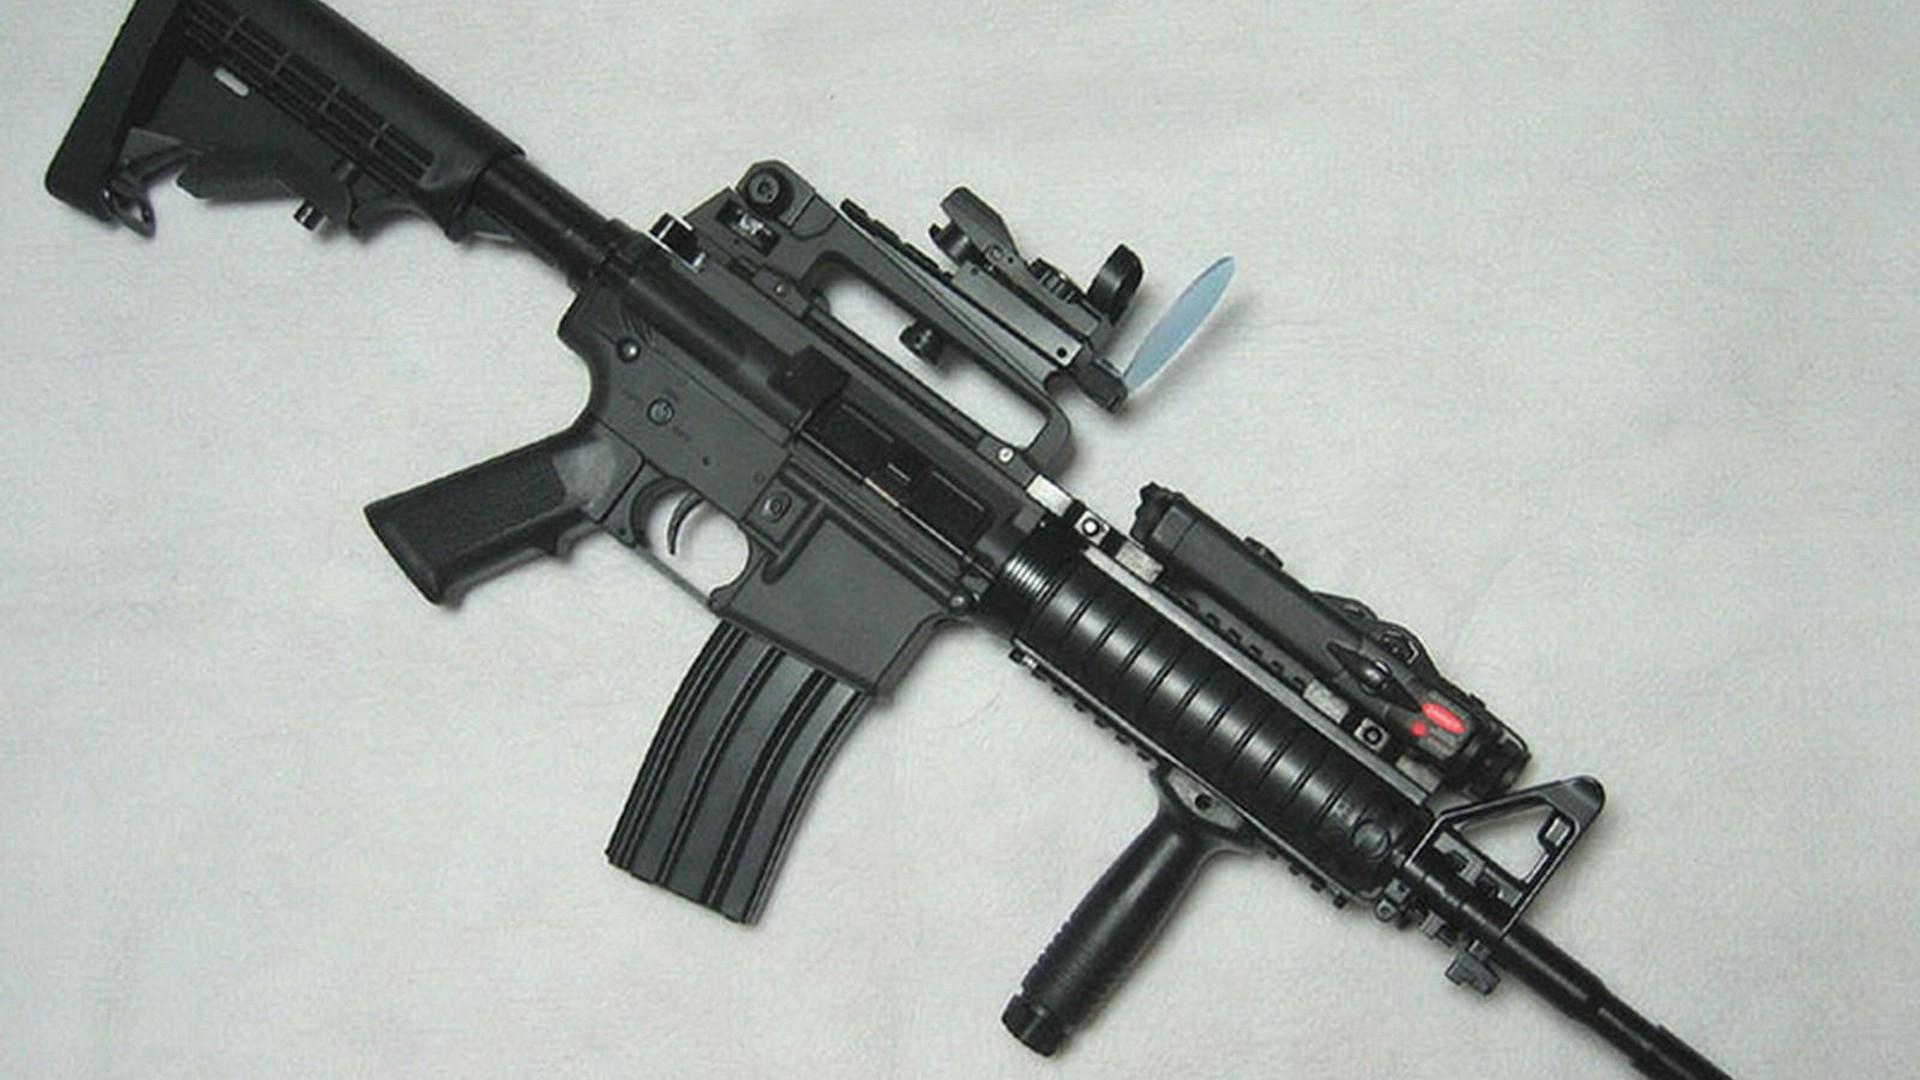 Hq Gun And Weapon  HD Wallpaper